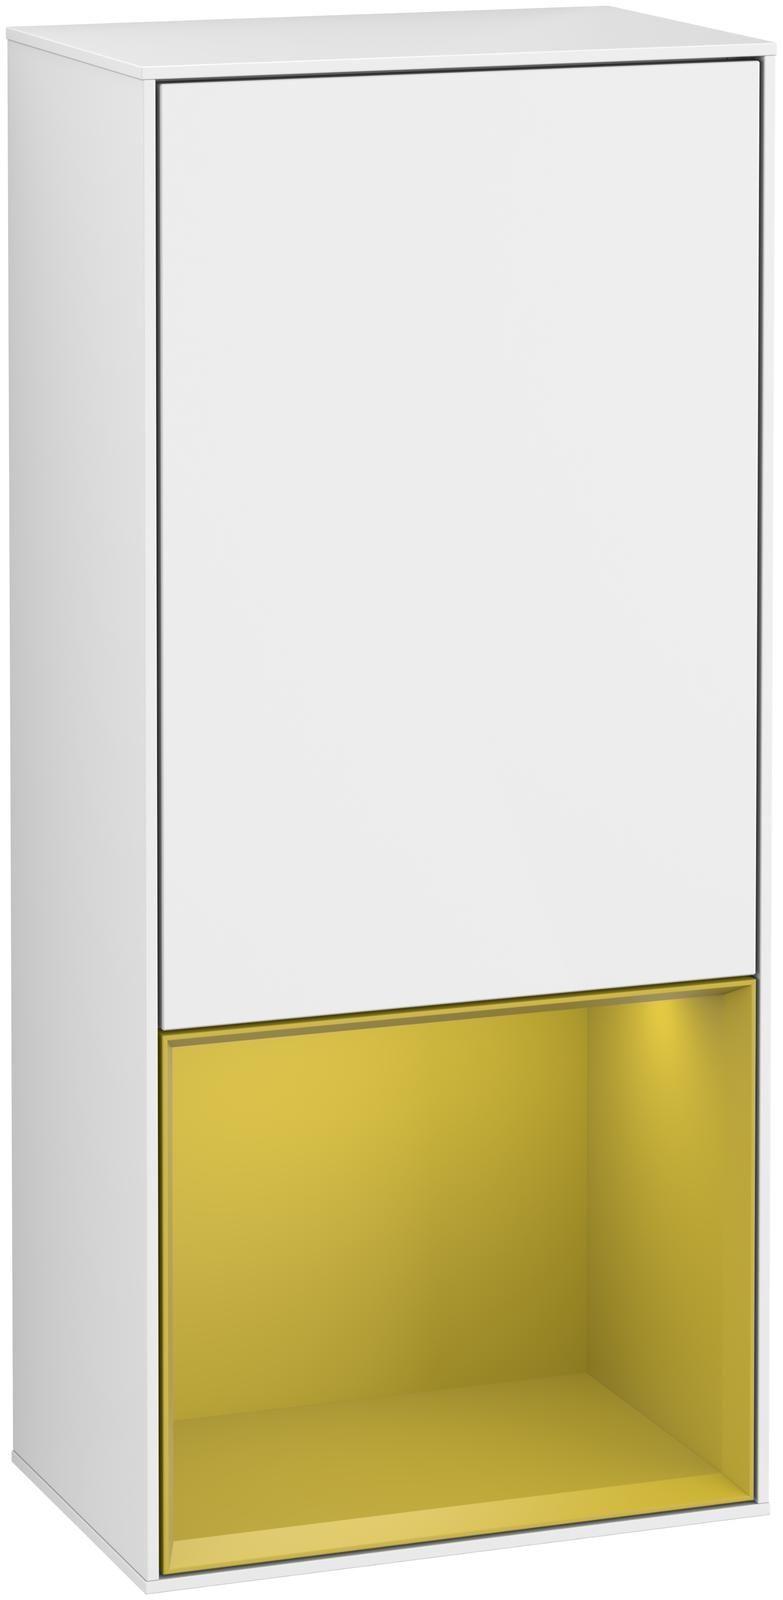 Villeroy & Boch Finion F55 Seitenschrank mit Regalelement 1 Tür Anschlag rechts LED-Beleuchtung B:41,8xH:93,6xT:27cm Front, Korpus: Glossy White Lack, Regal: Sun F550HEGF